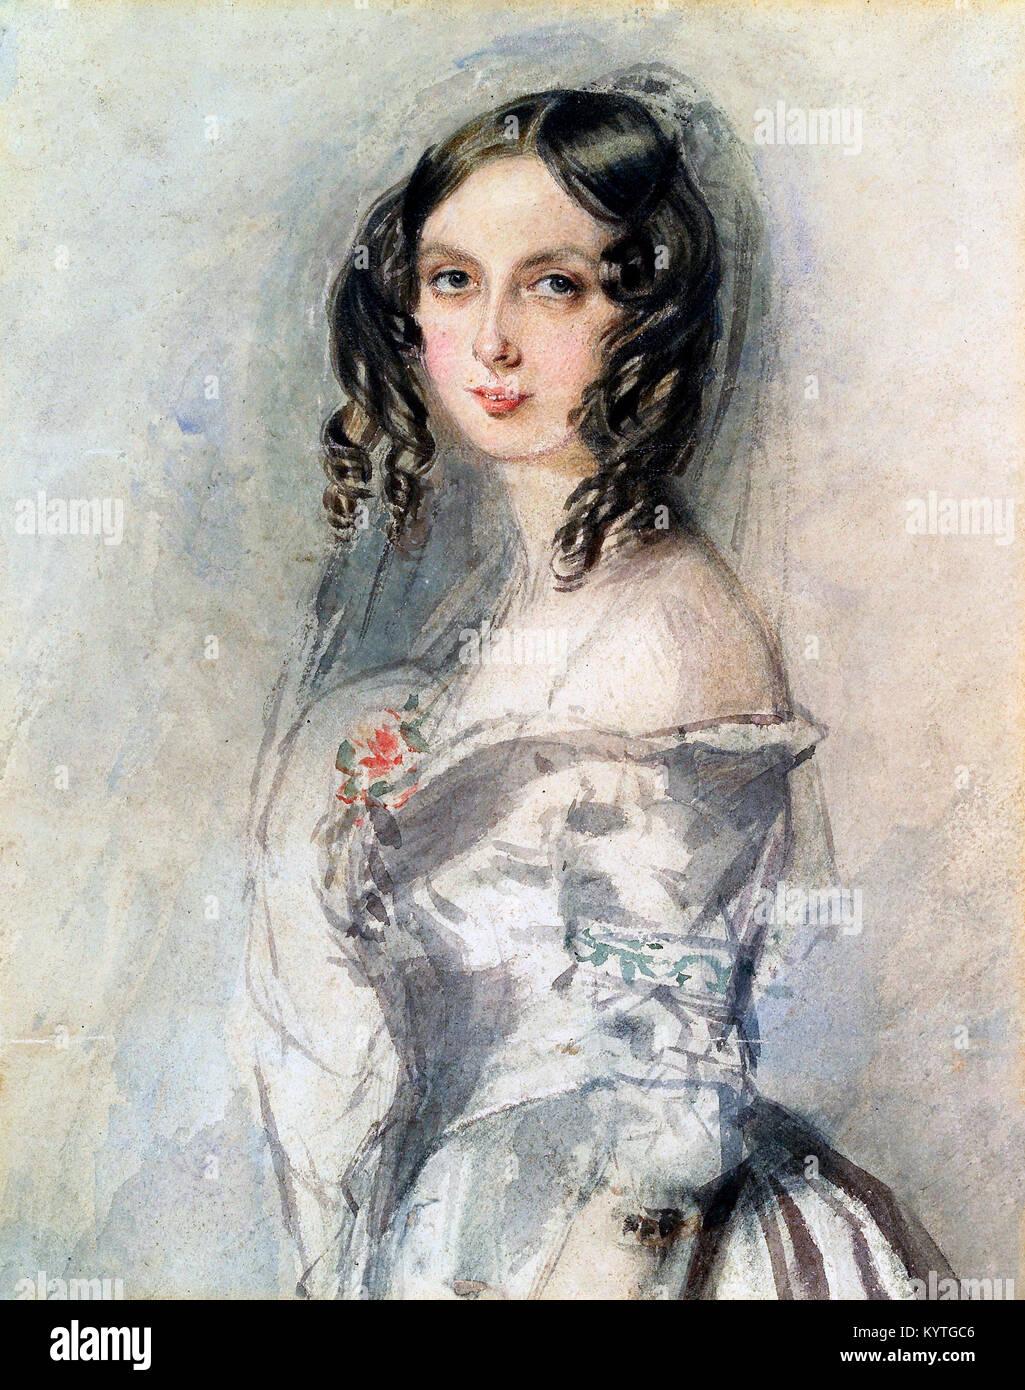 Ada Lovelace. Augusta Ada King-Noel, Countess of Lovelace (nee Byron; 1815-1852), an English mathematician and writer, - Stock Image